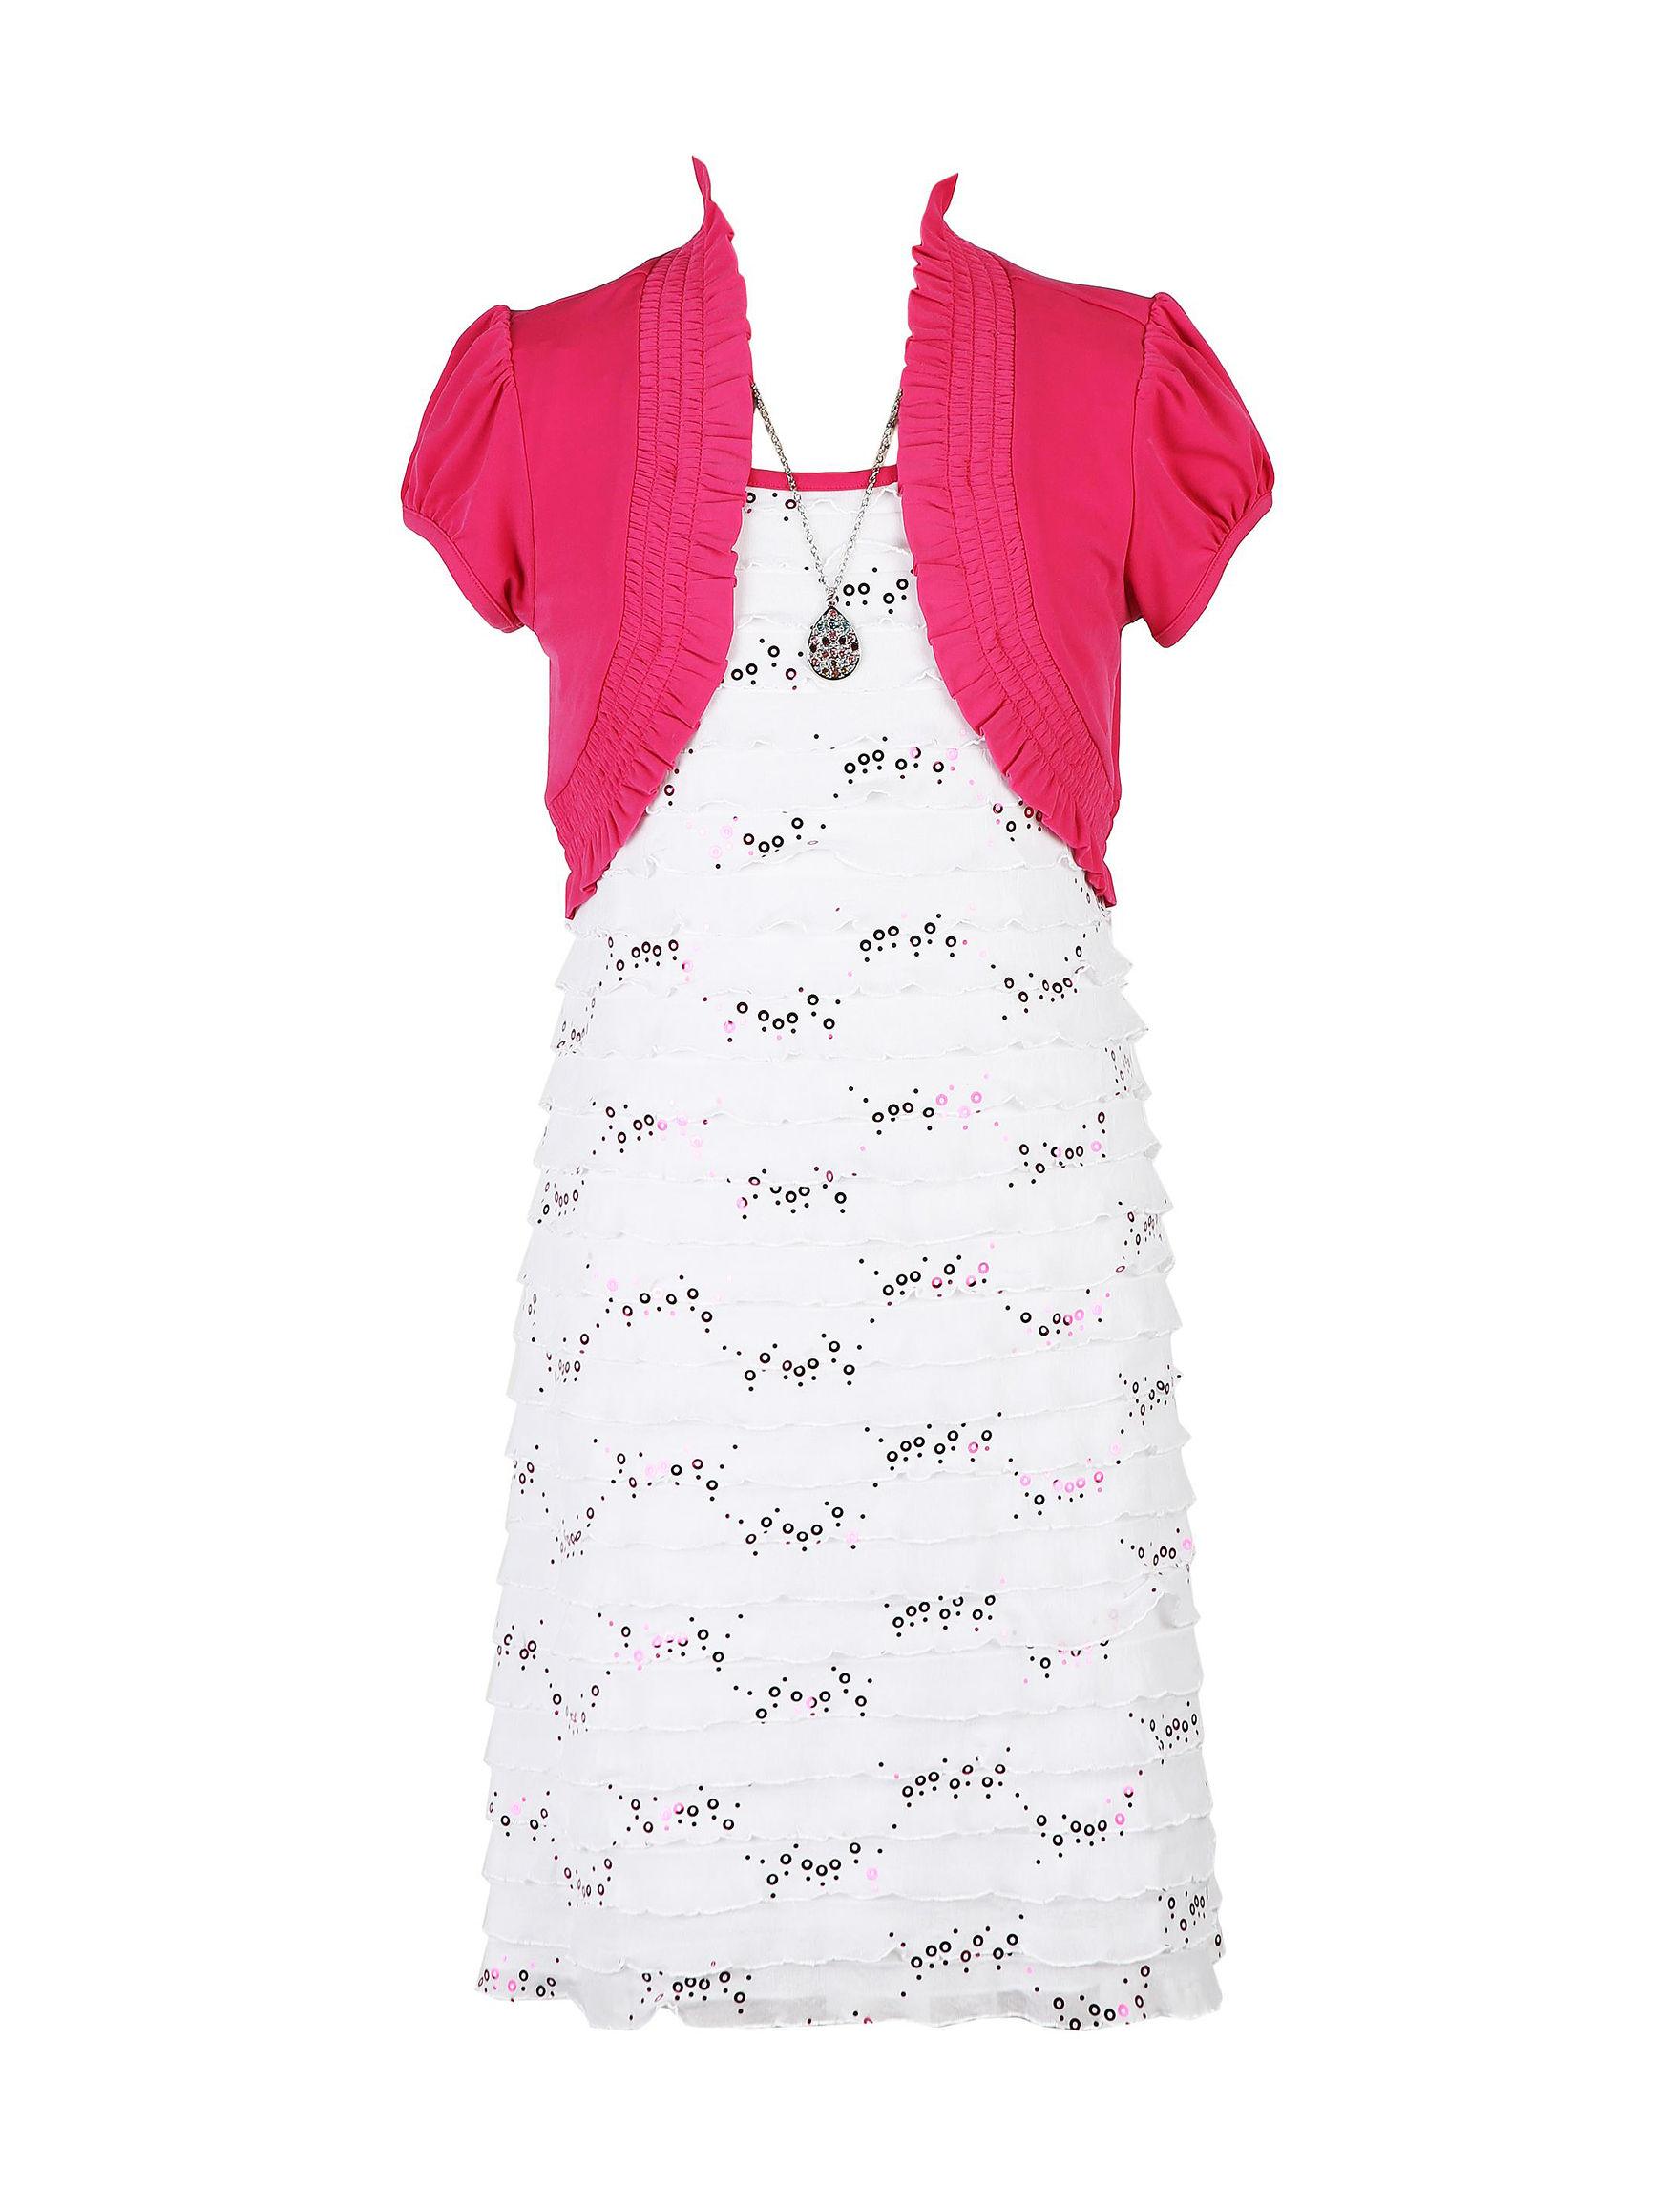 226e2810548a Speechless 2-pc. Lace Sequin Dress   Shrug Set - Girls Plus